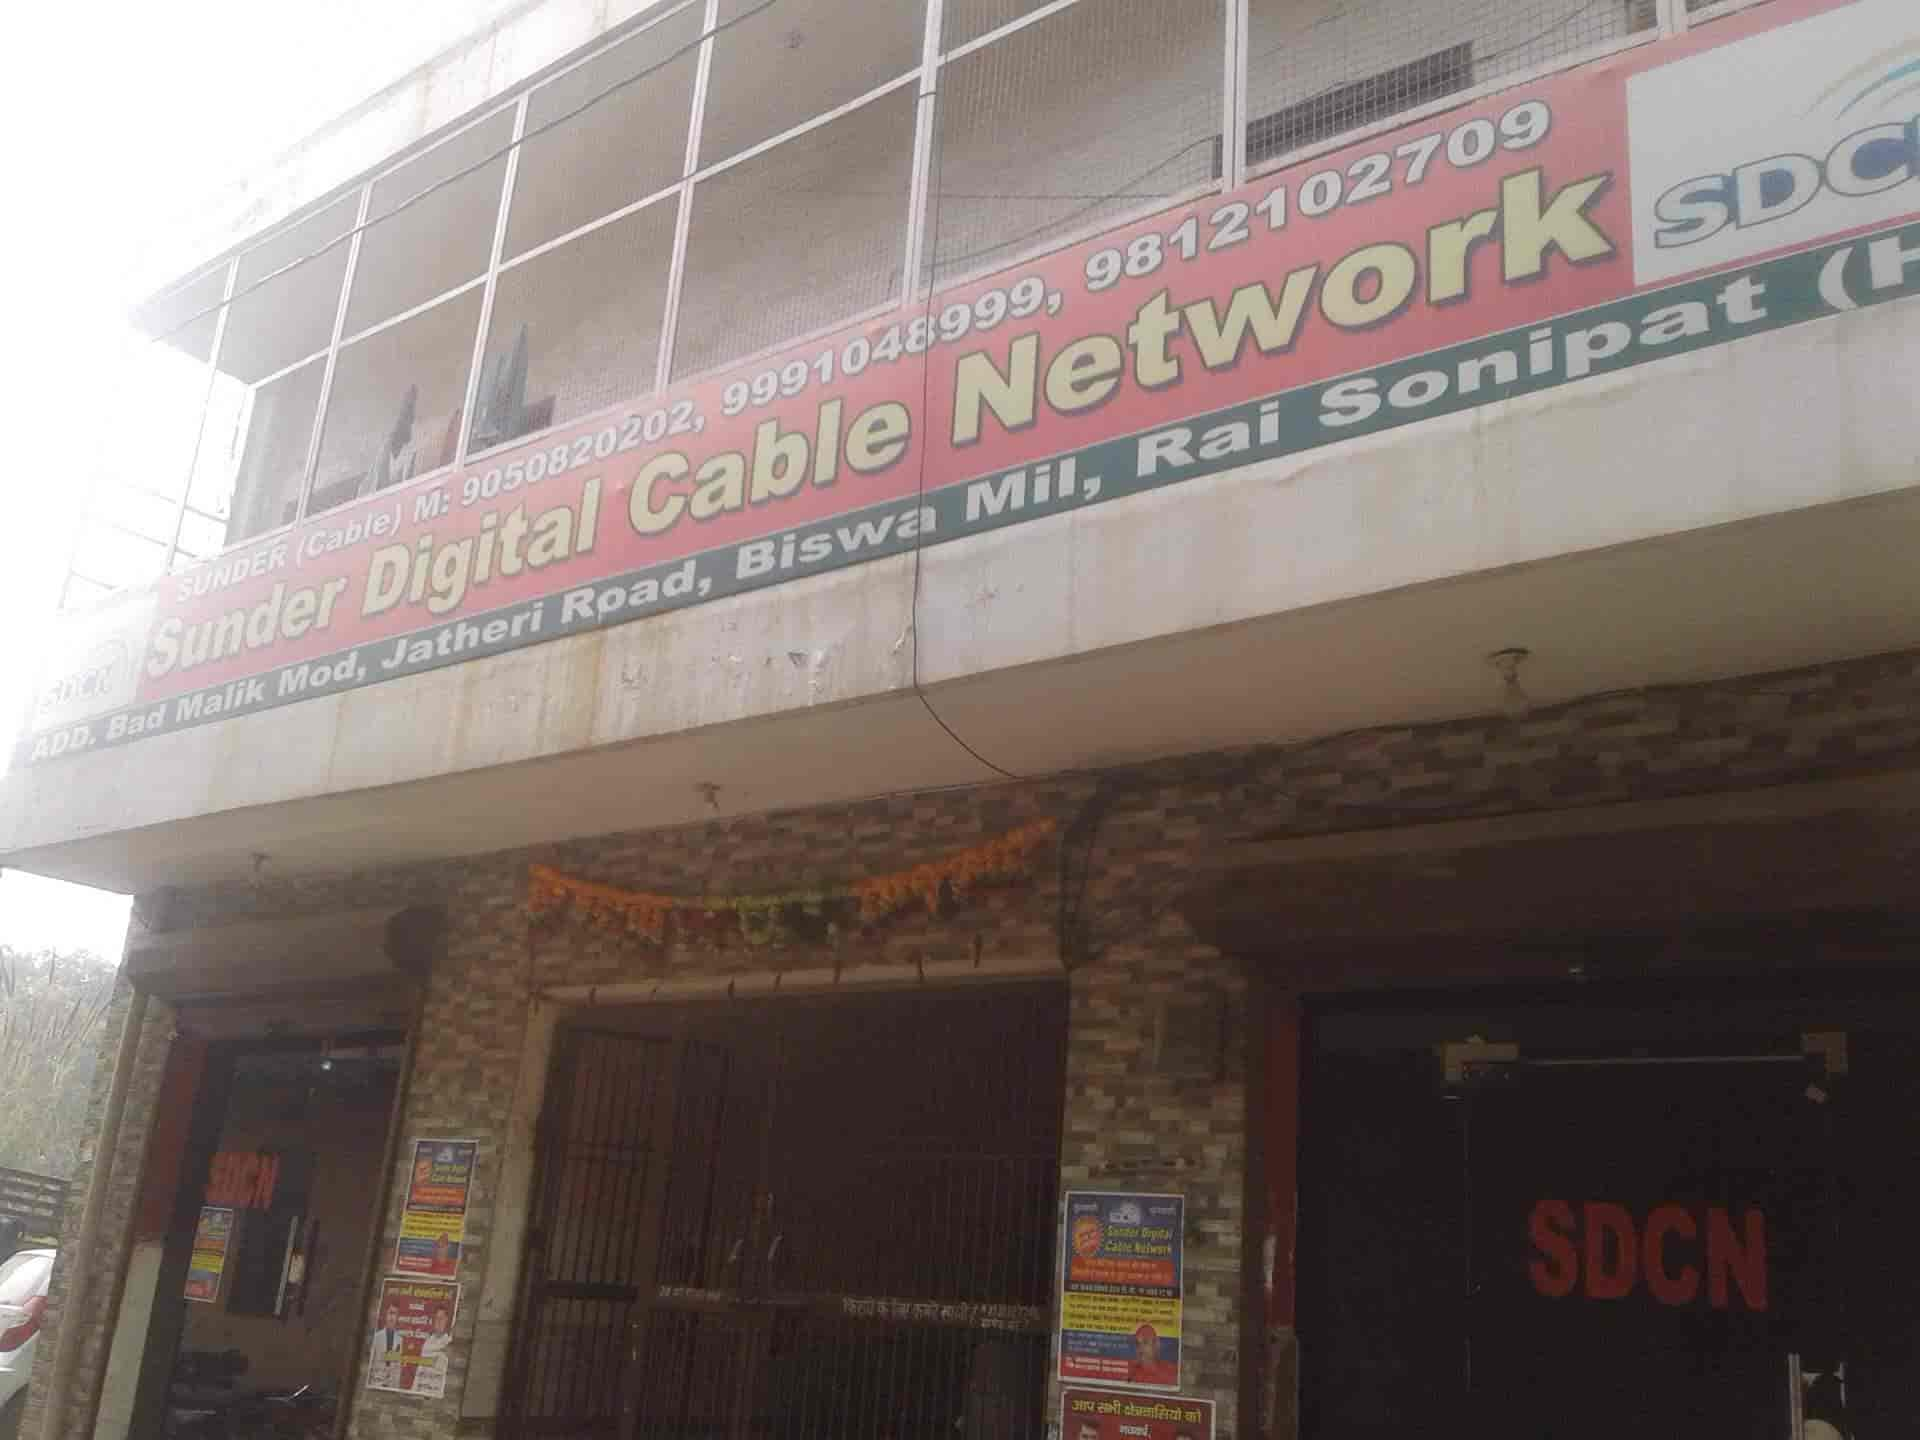 Sunder Digital Cable Network, Rai - Internet Service